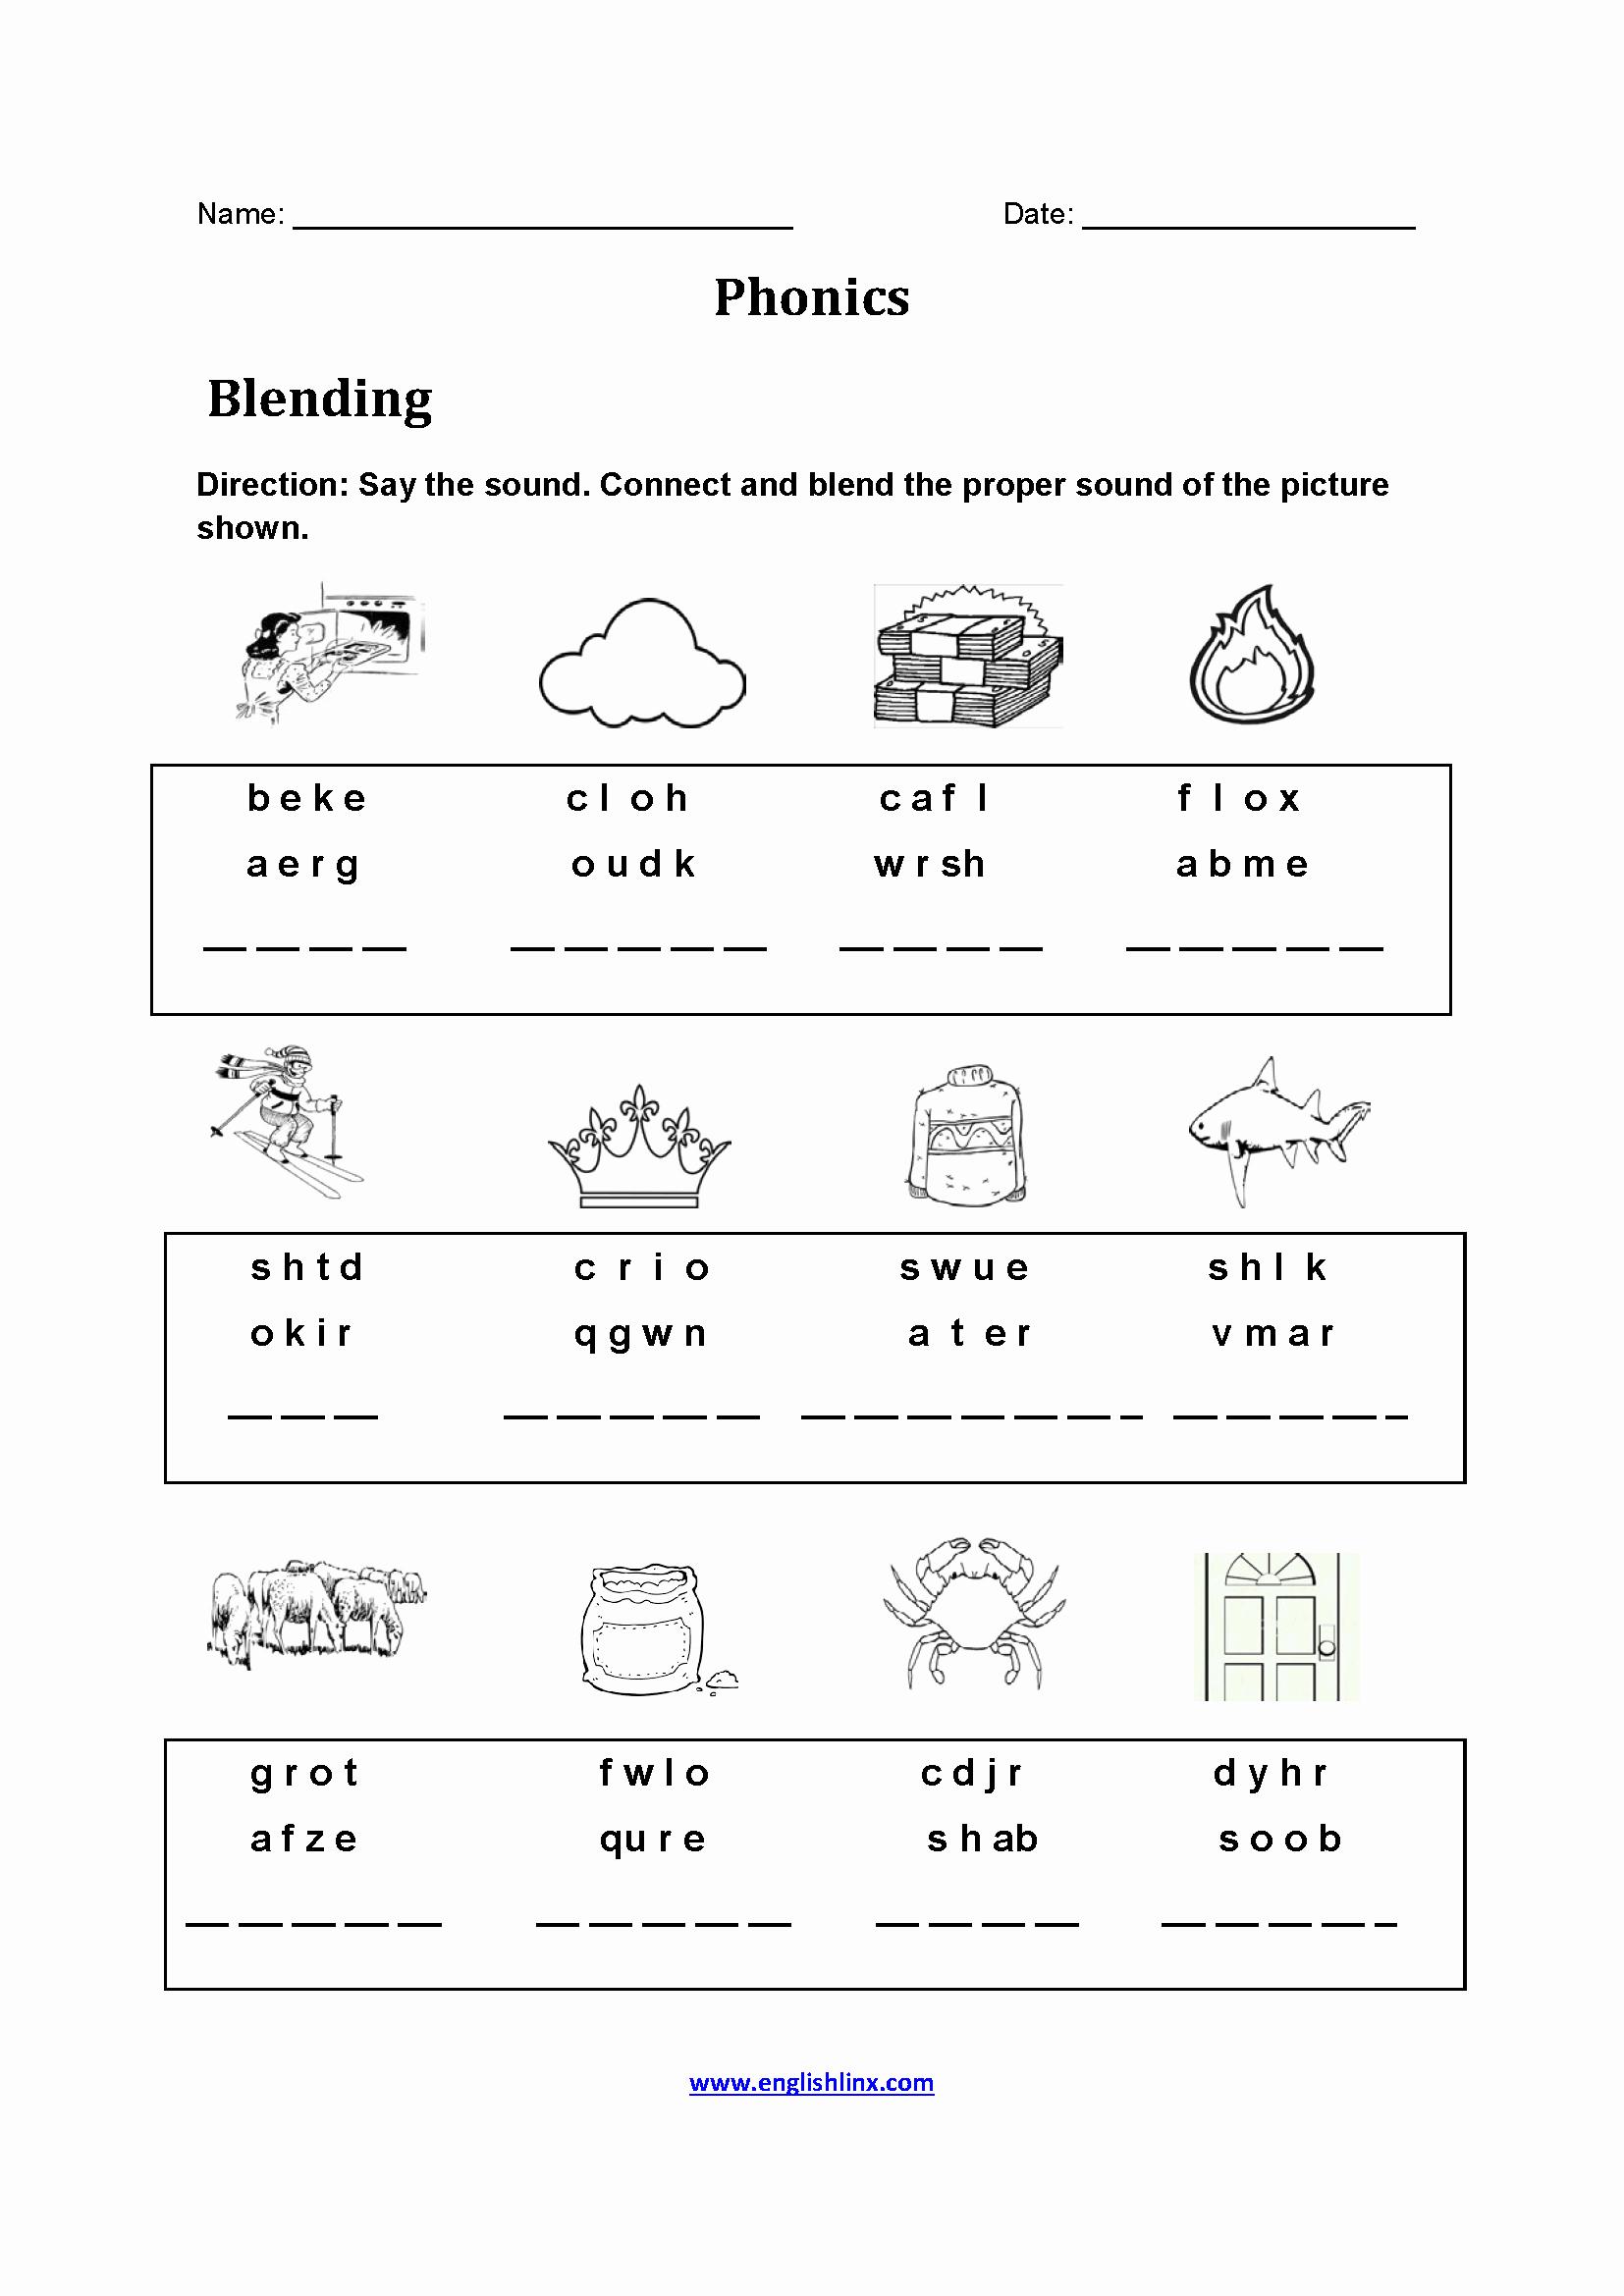 Ou Ow Worksheets 3rd Grade Fresh Printable 3rd Grade Phonics Worksheets thekidsworksheet